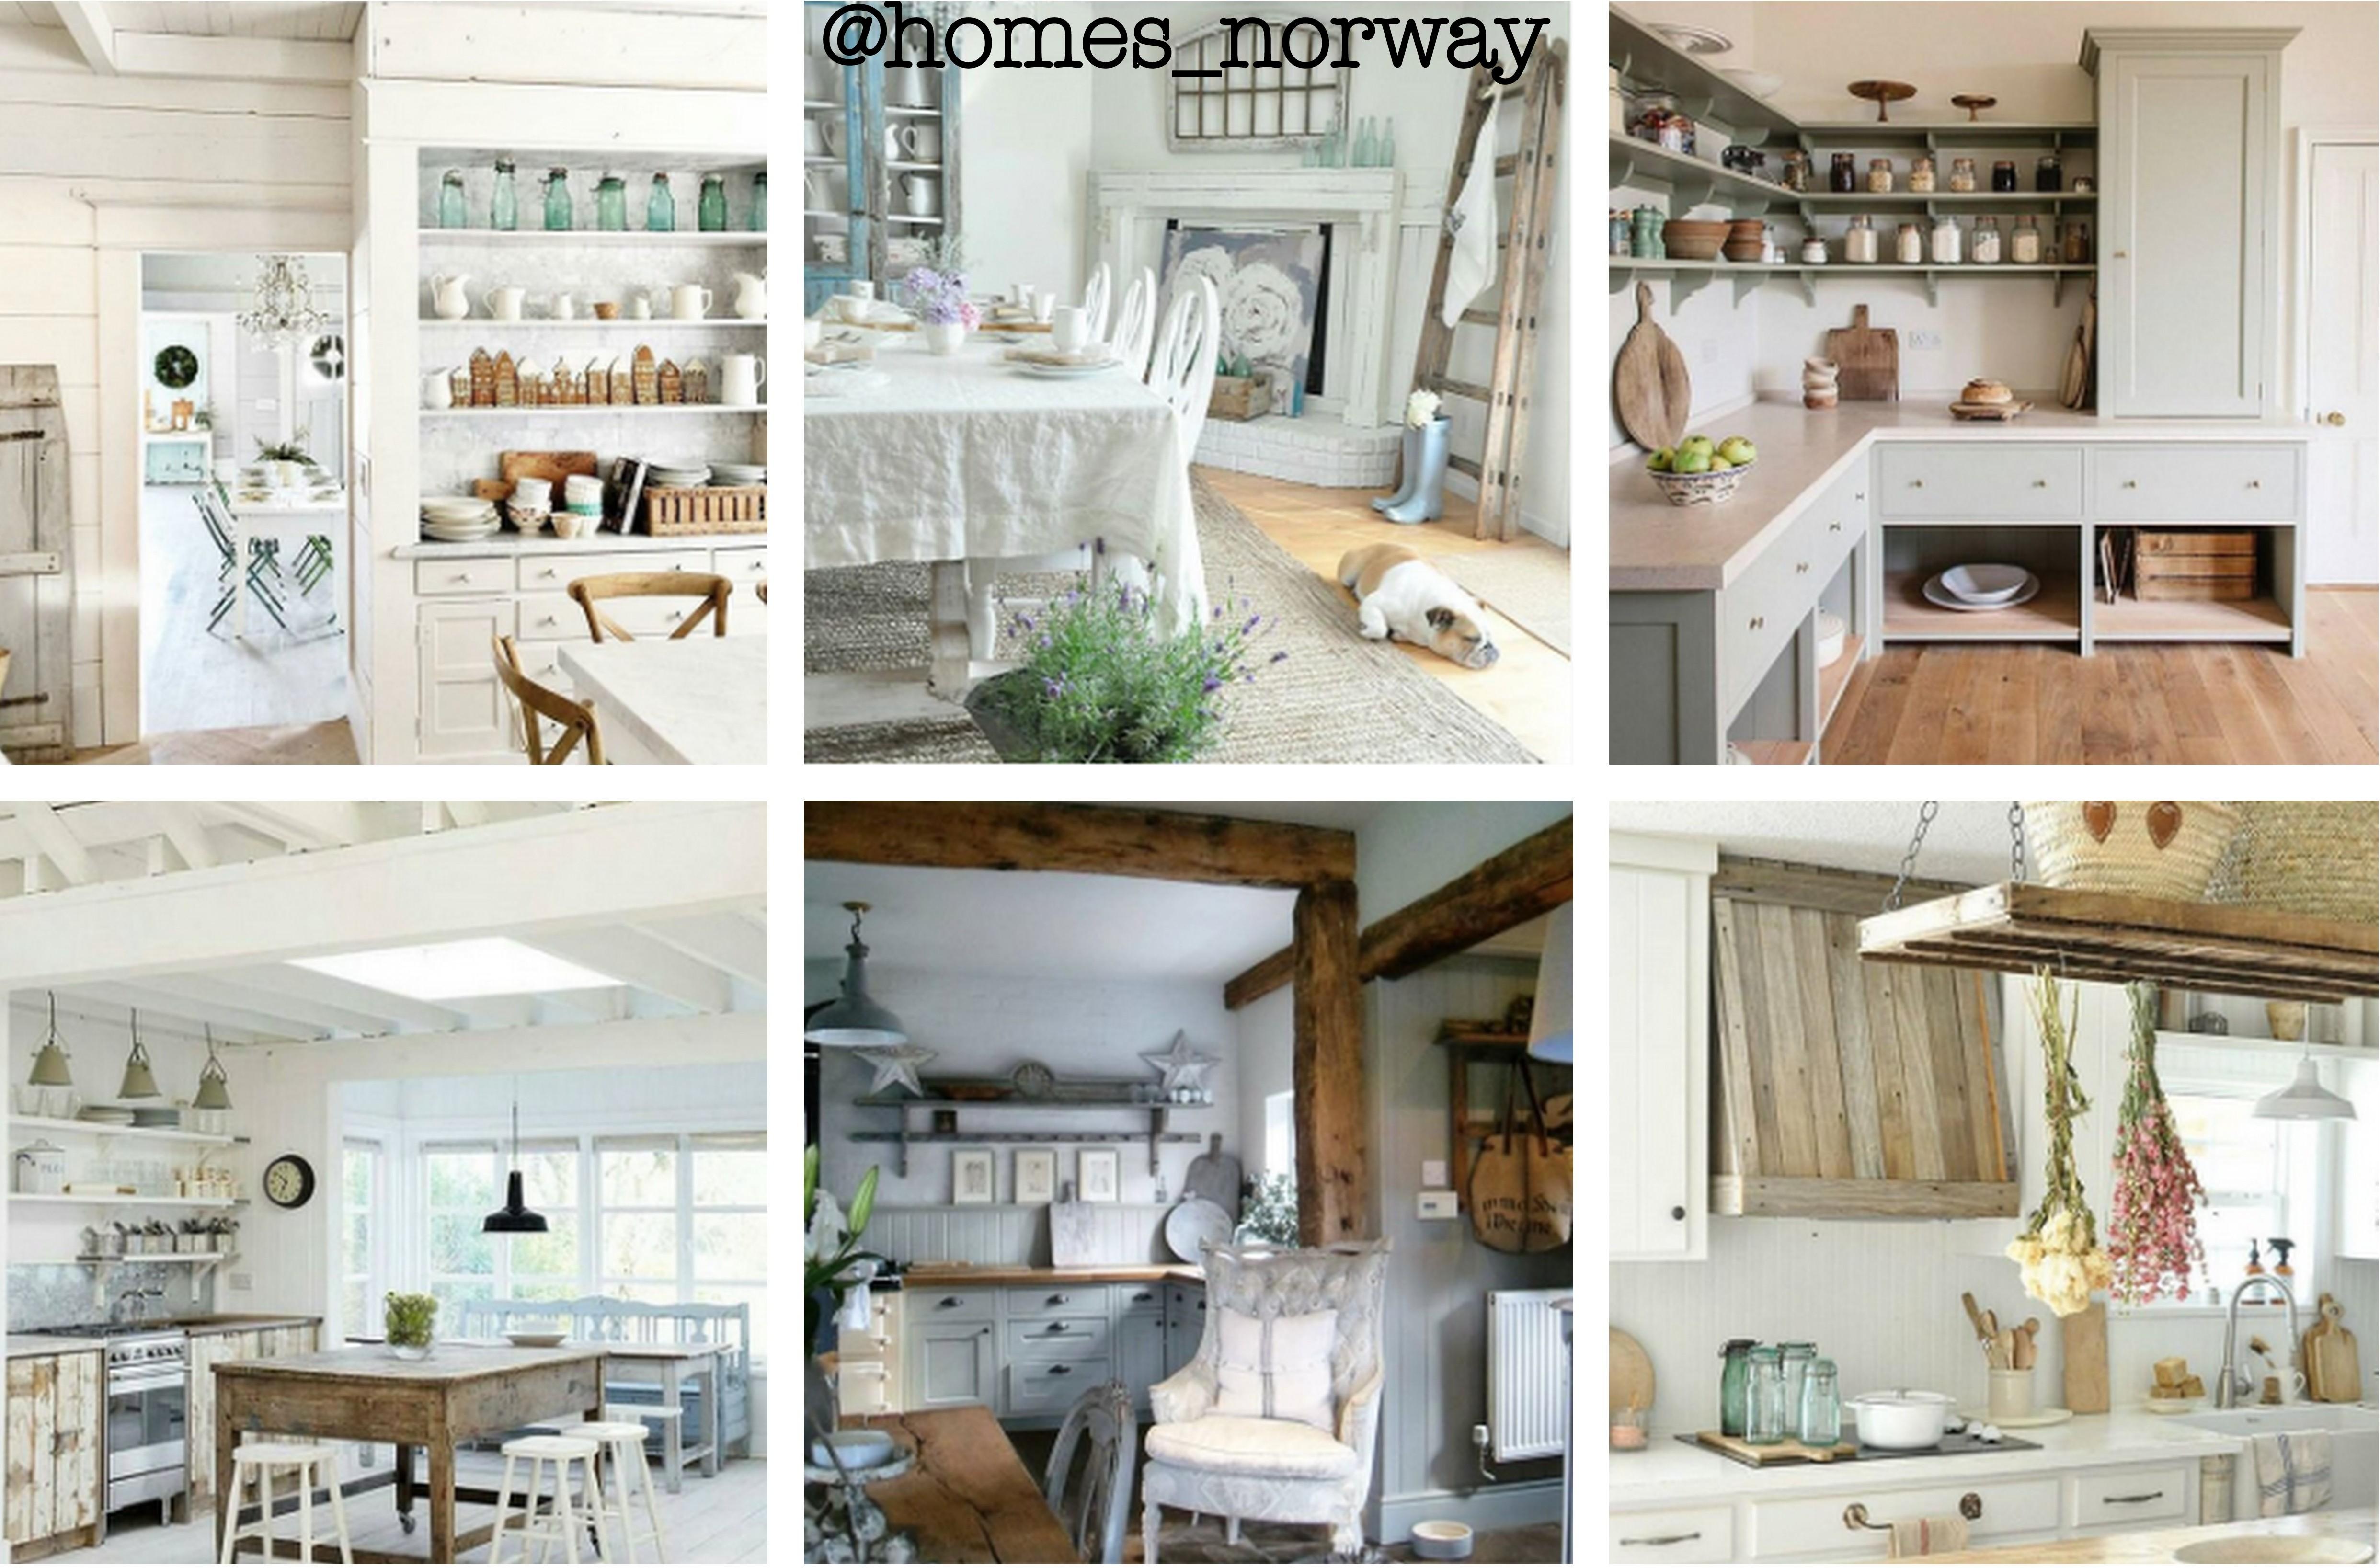 homesnorway